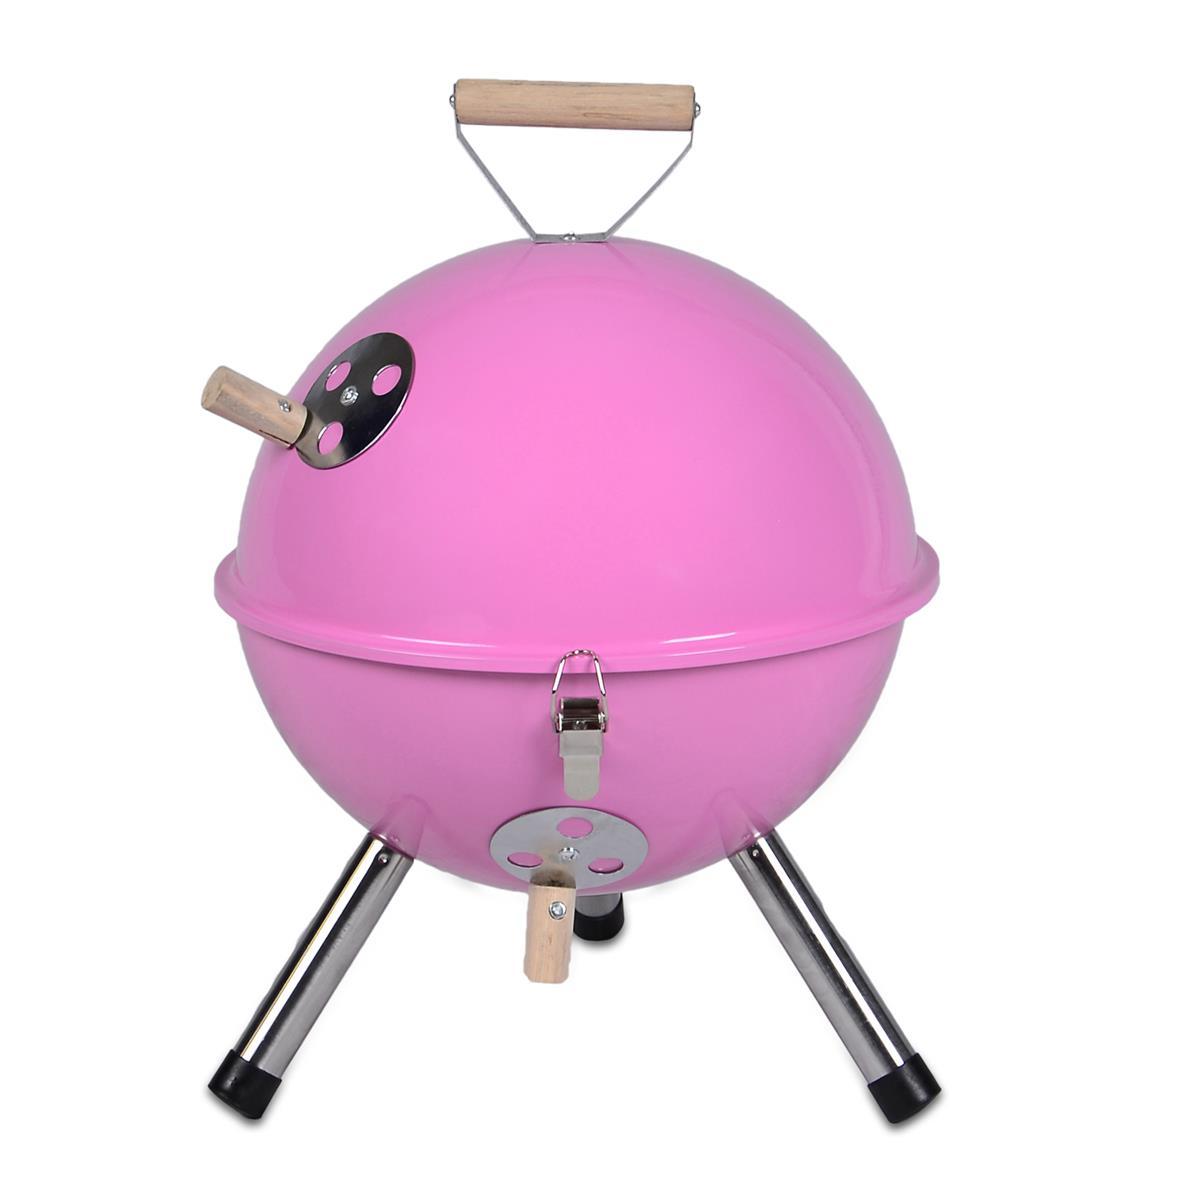 Mini BBQ-Grill Holzkohle Kugelgrill PINK Picknickgrill